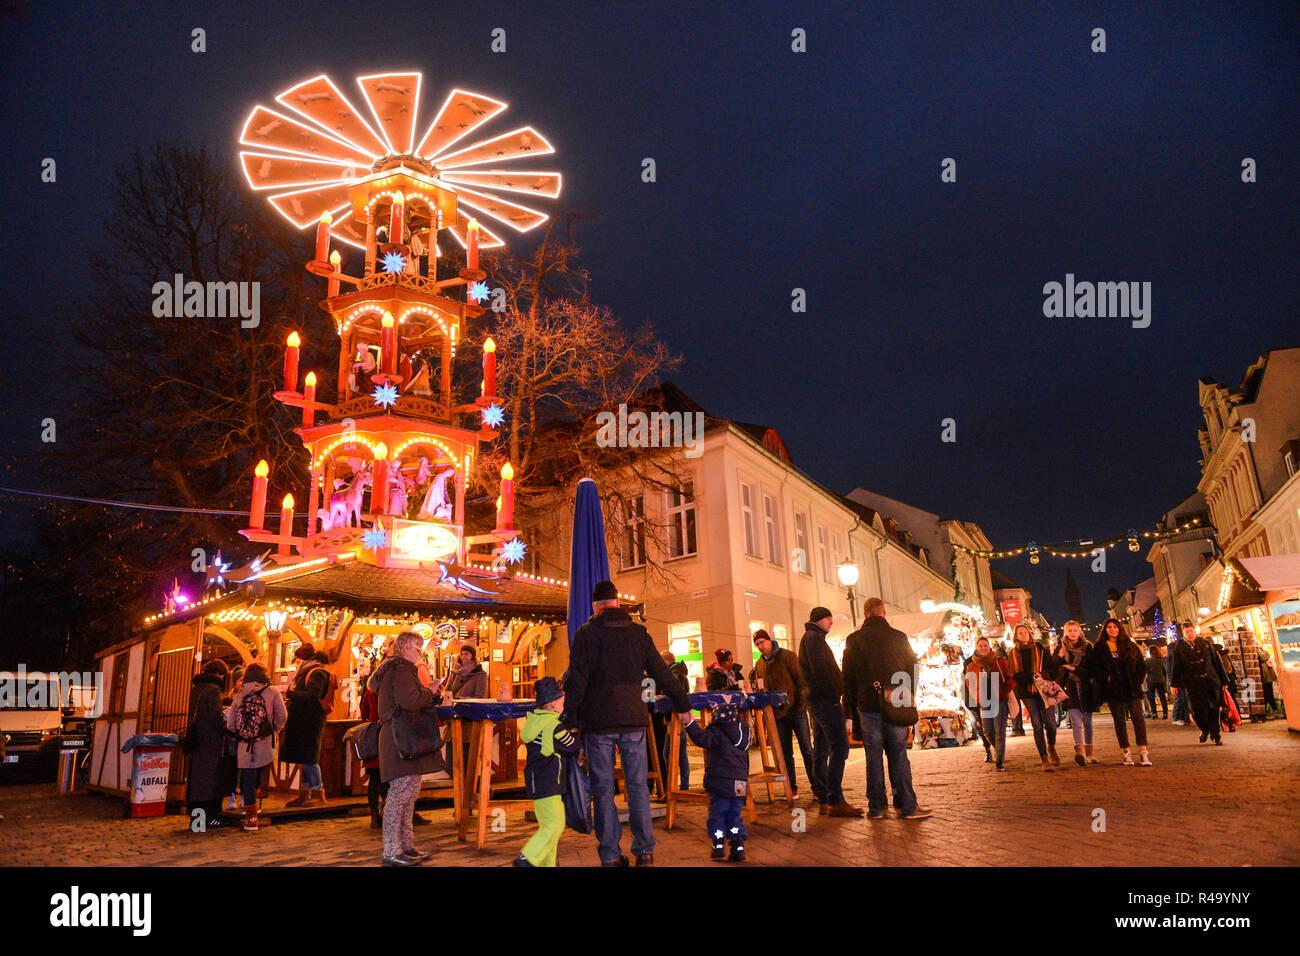 Potsdam Christmas Market 2020 Potsdam, Germany. 26th Nov, 2018. Visitors walk over the Christmas